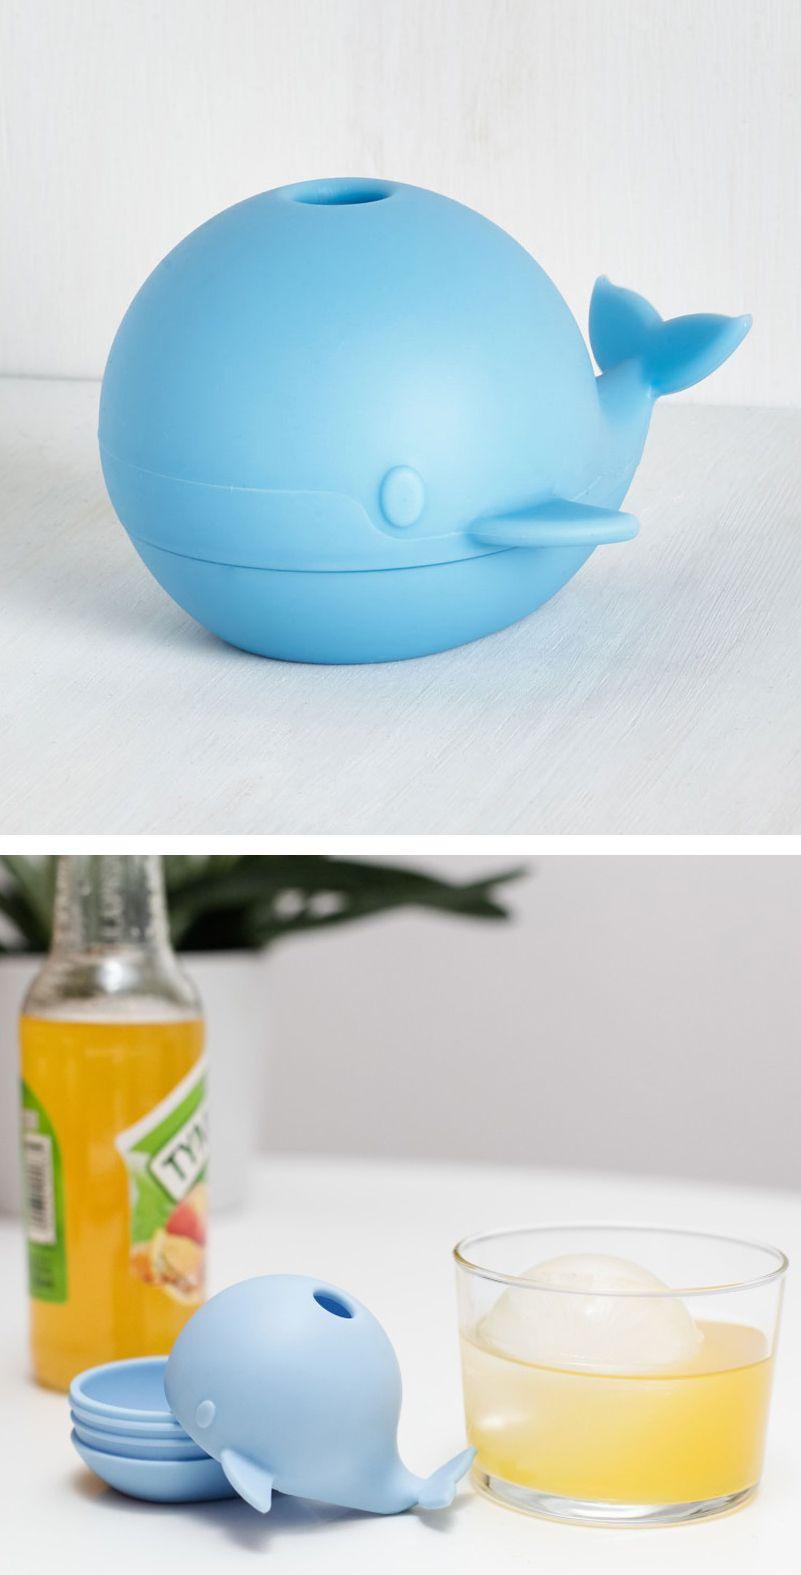 Whale ice mold | Unique products | Pinterest | Kitchens, Kitchen ...